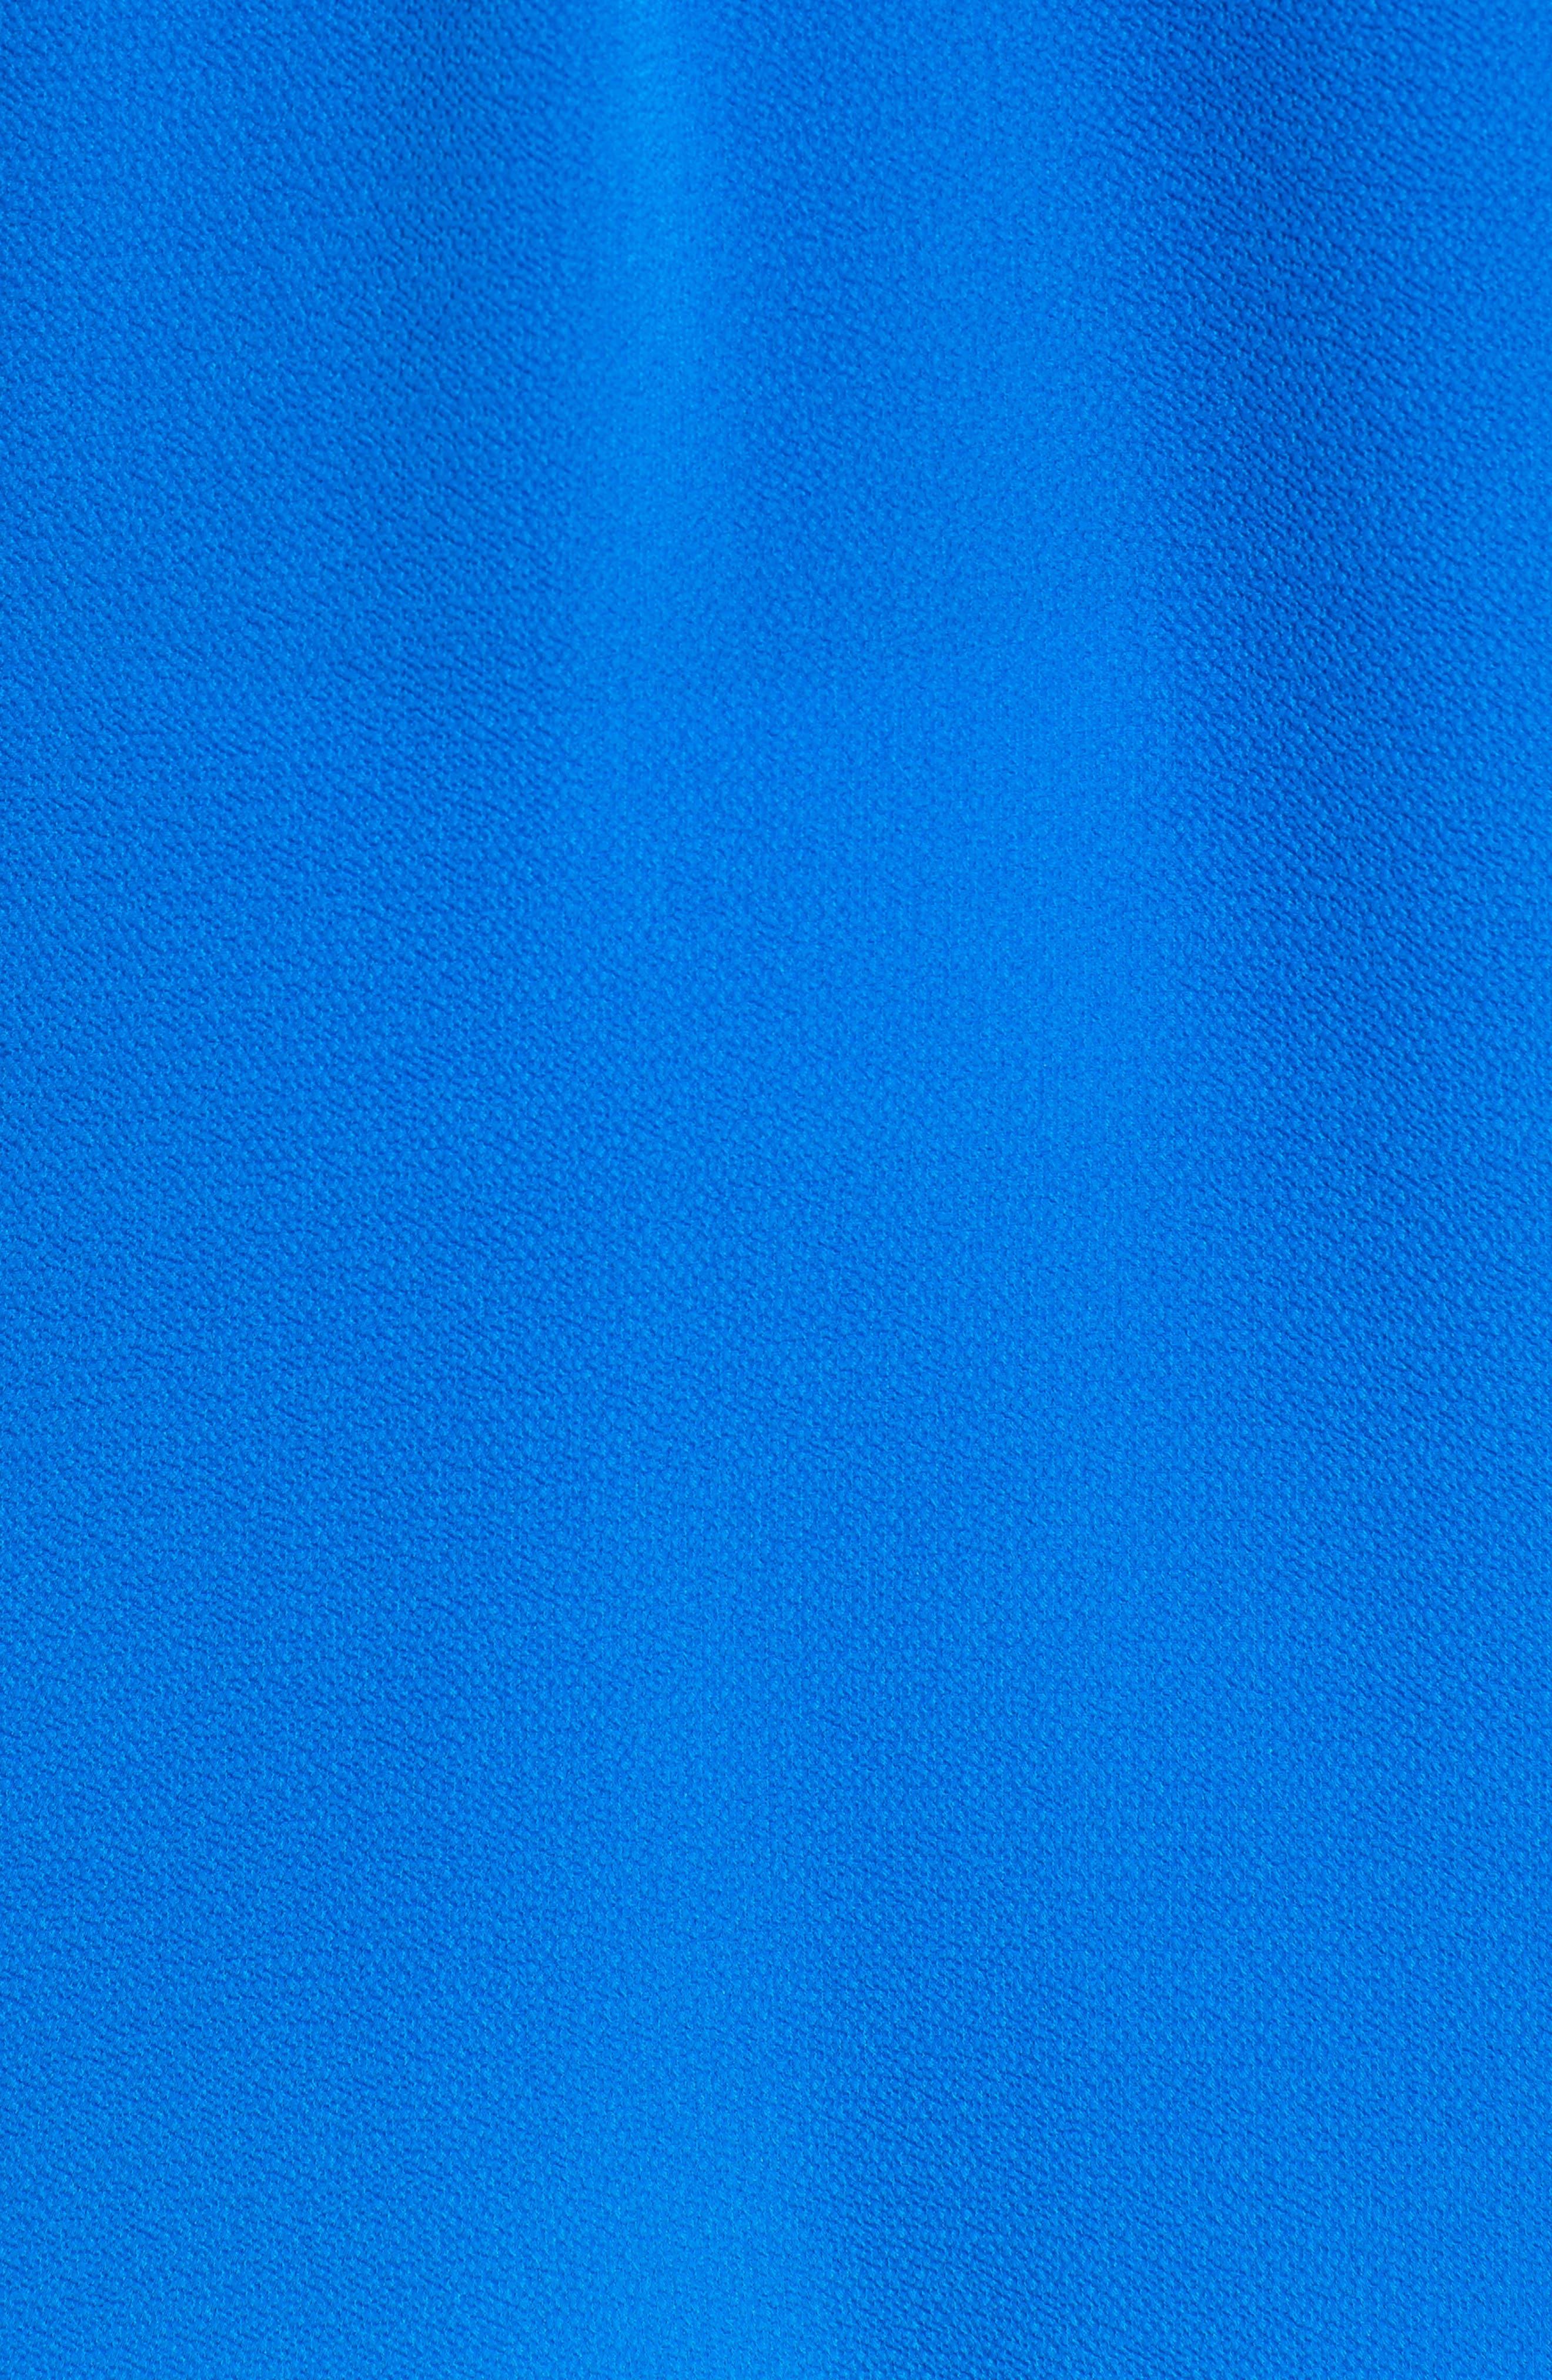 Slit Sleeve Blouse,                             Alternate thumbnail 5, color,                             497